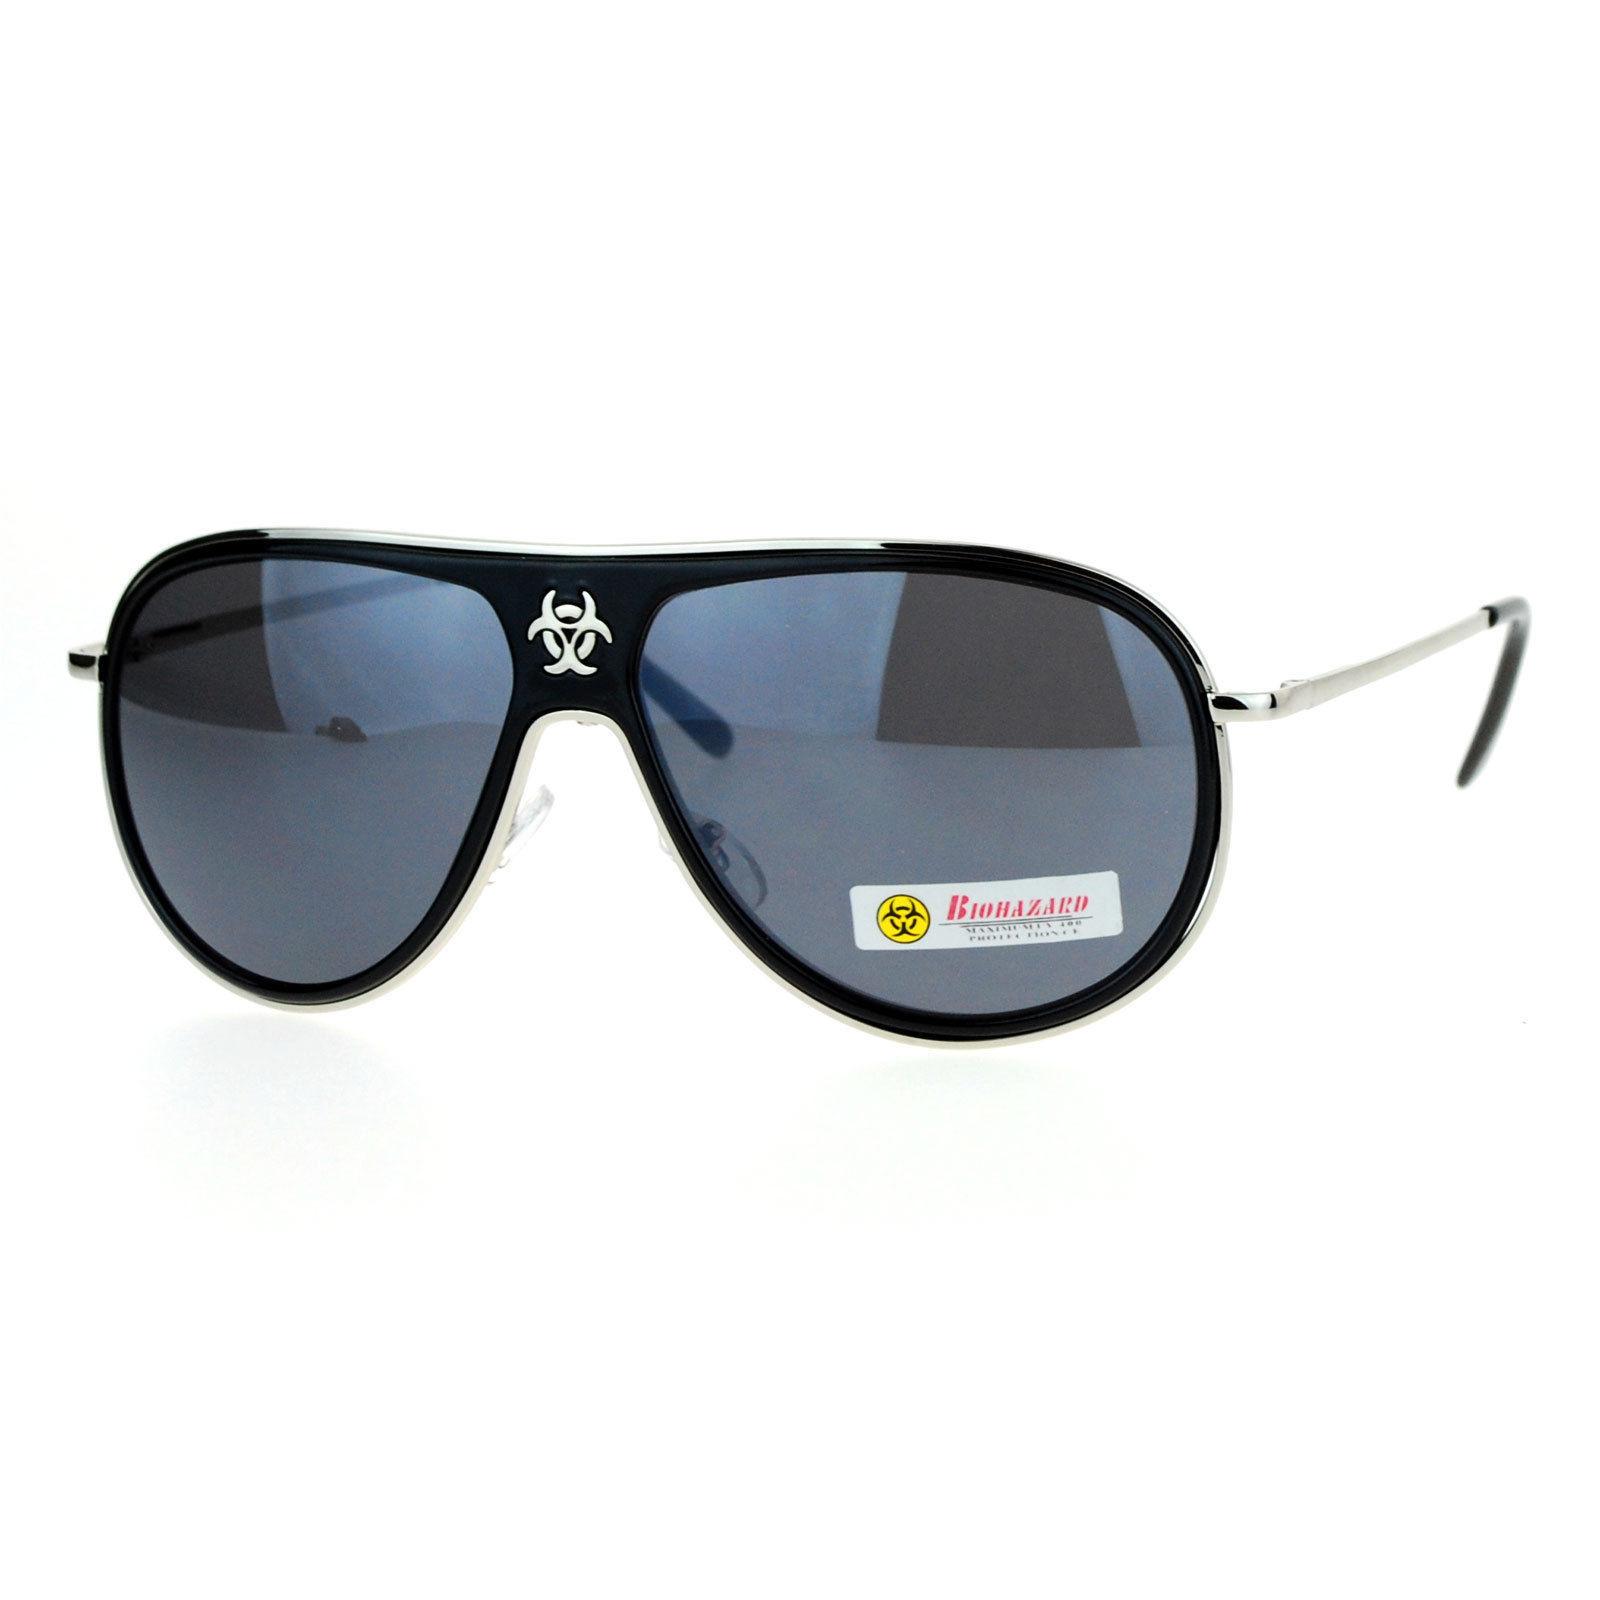 Biohazard Sunglasses Unisex Sports Round Racer Aviator Shades UV 400